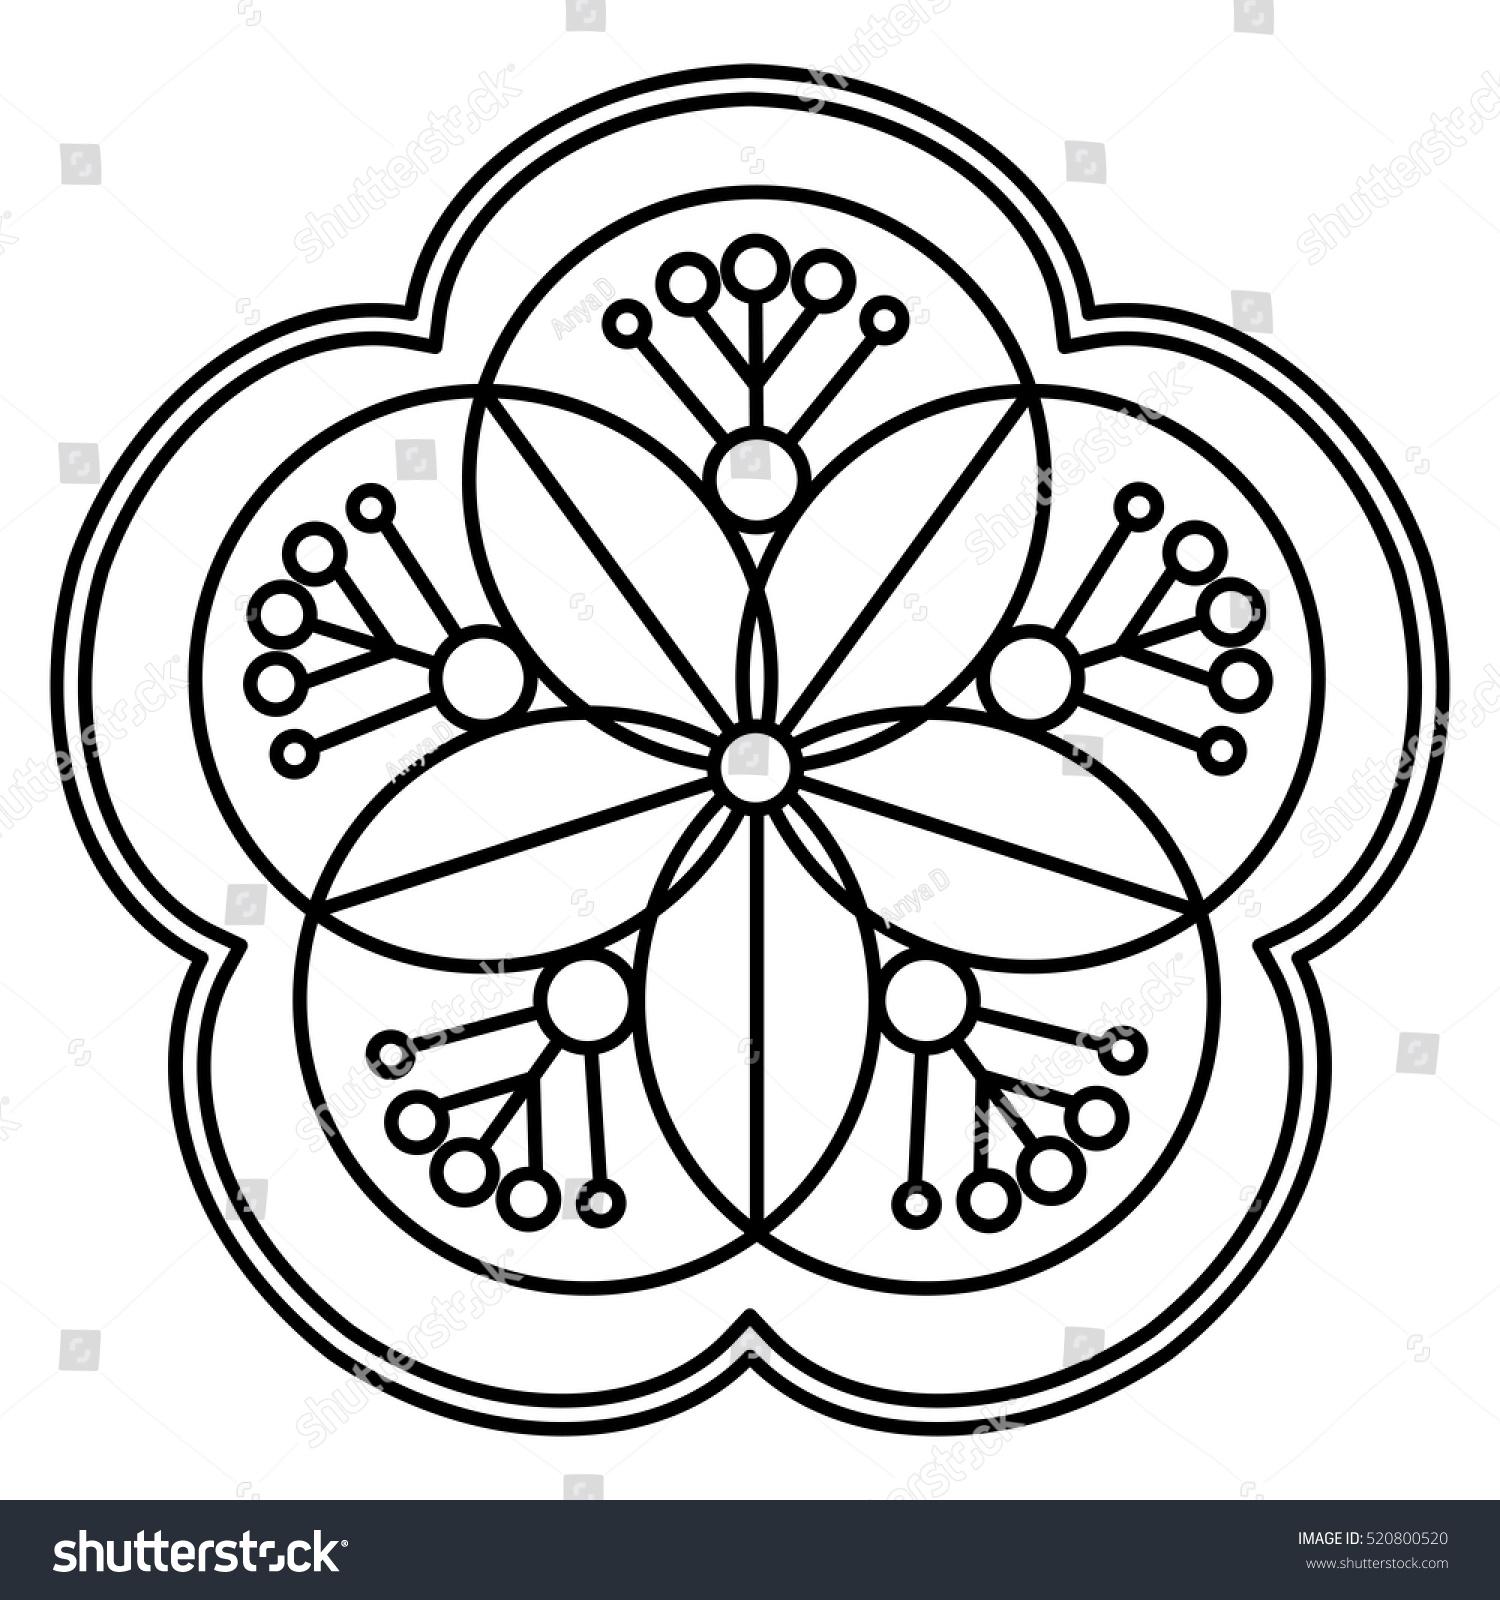 simple flower mandala pattern coloring book stock vector 520800520